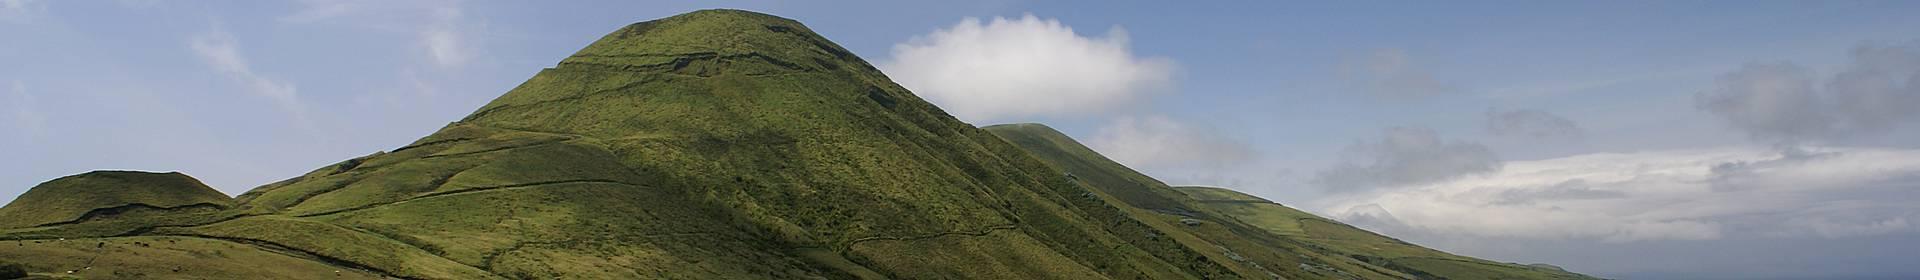 Pico da Esperanca